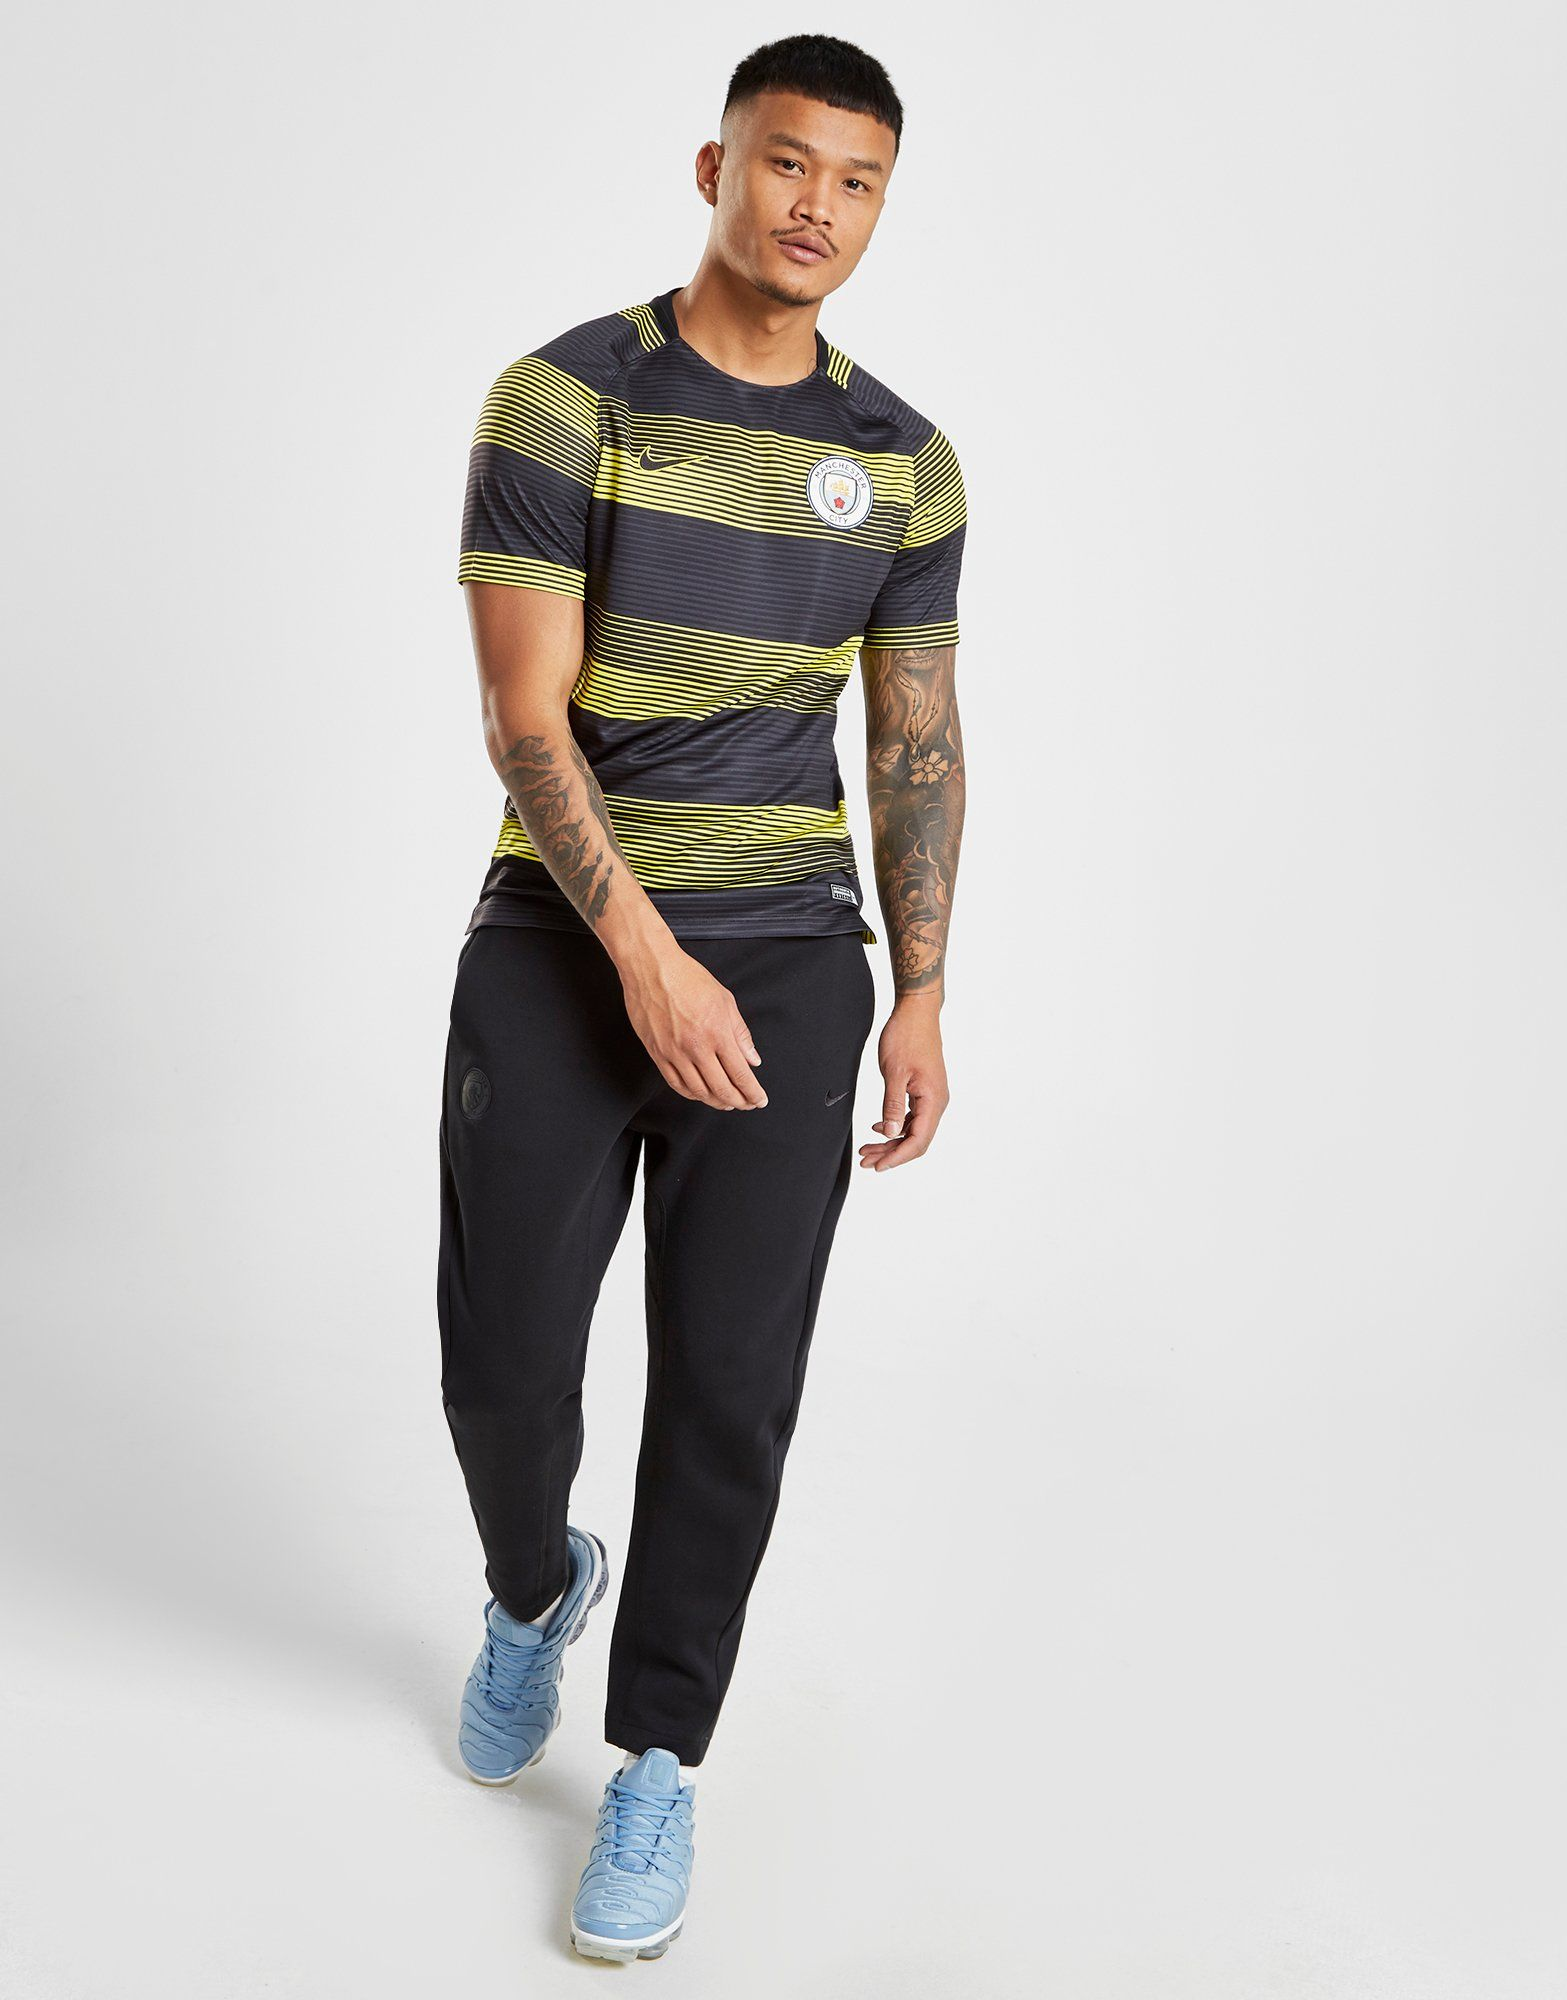 NIKE Manchester City FC Dri-FIT Squad Men's Short-Sleeve Football Top